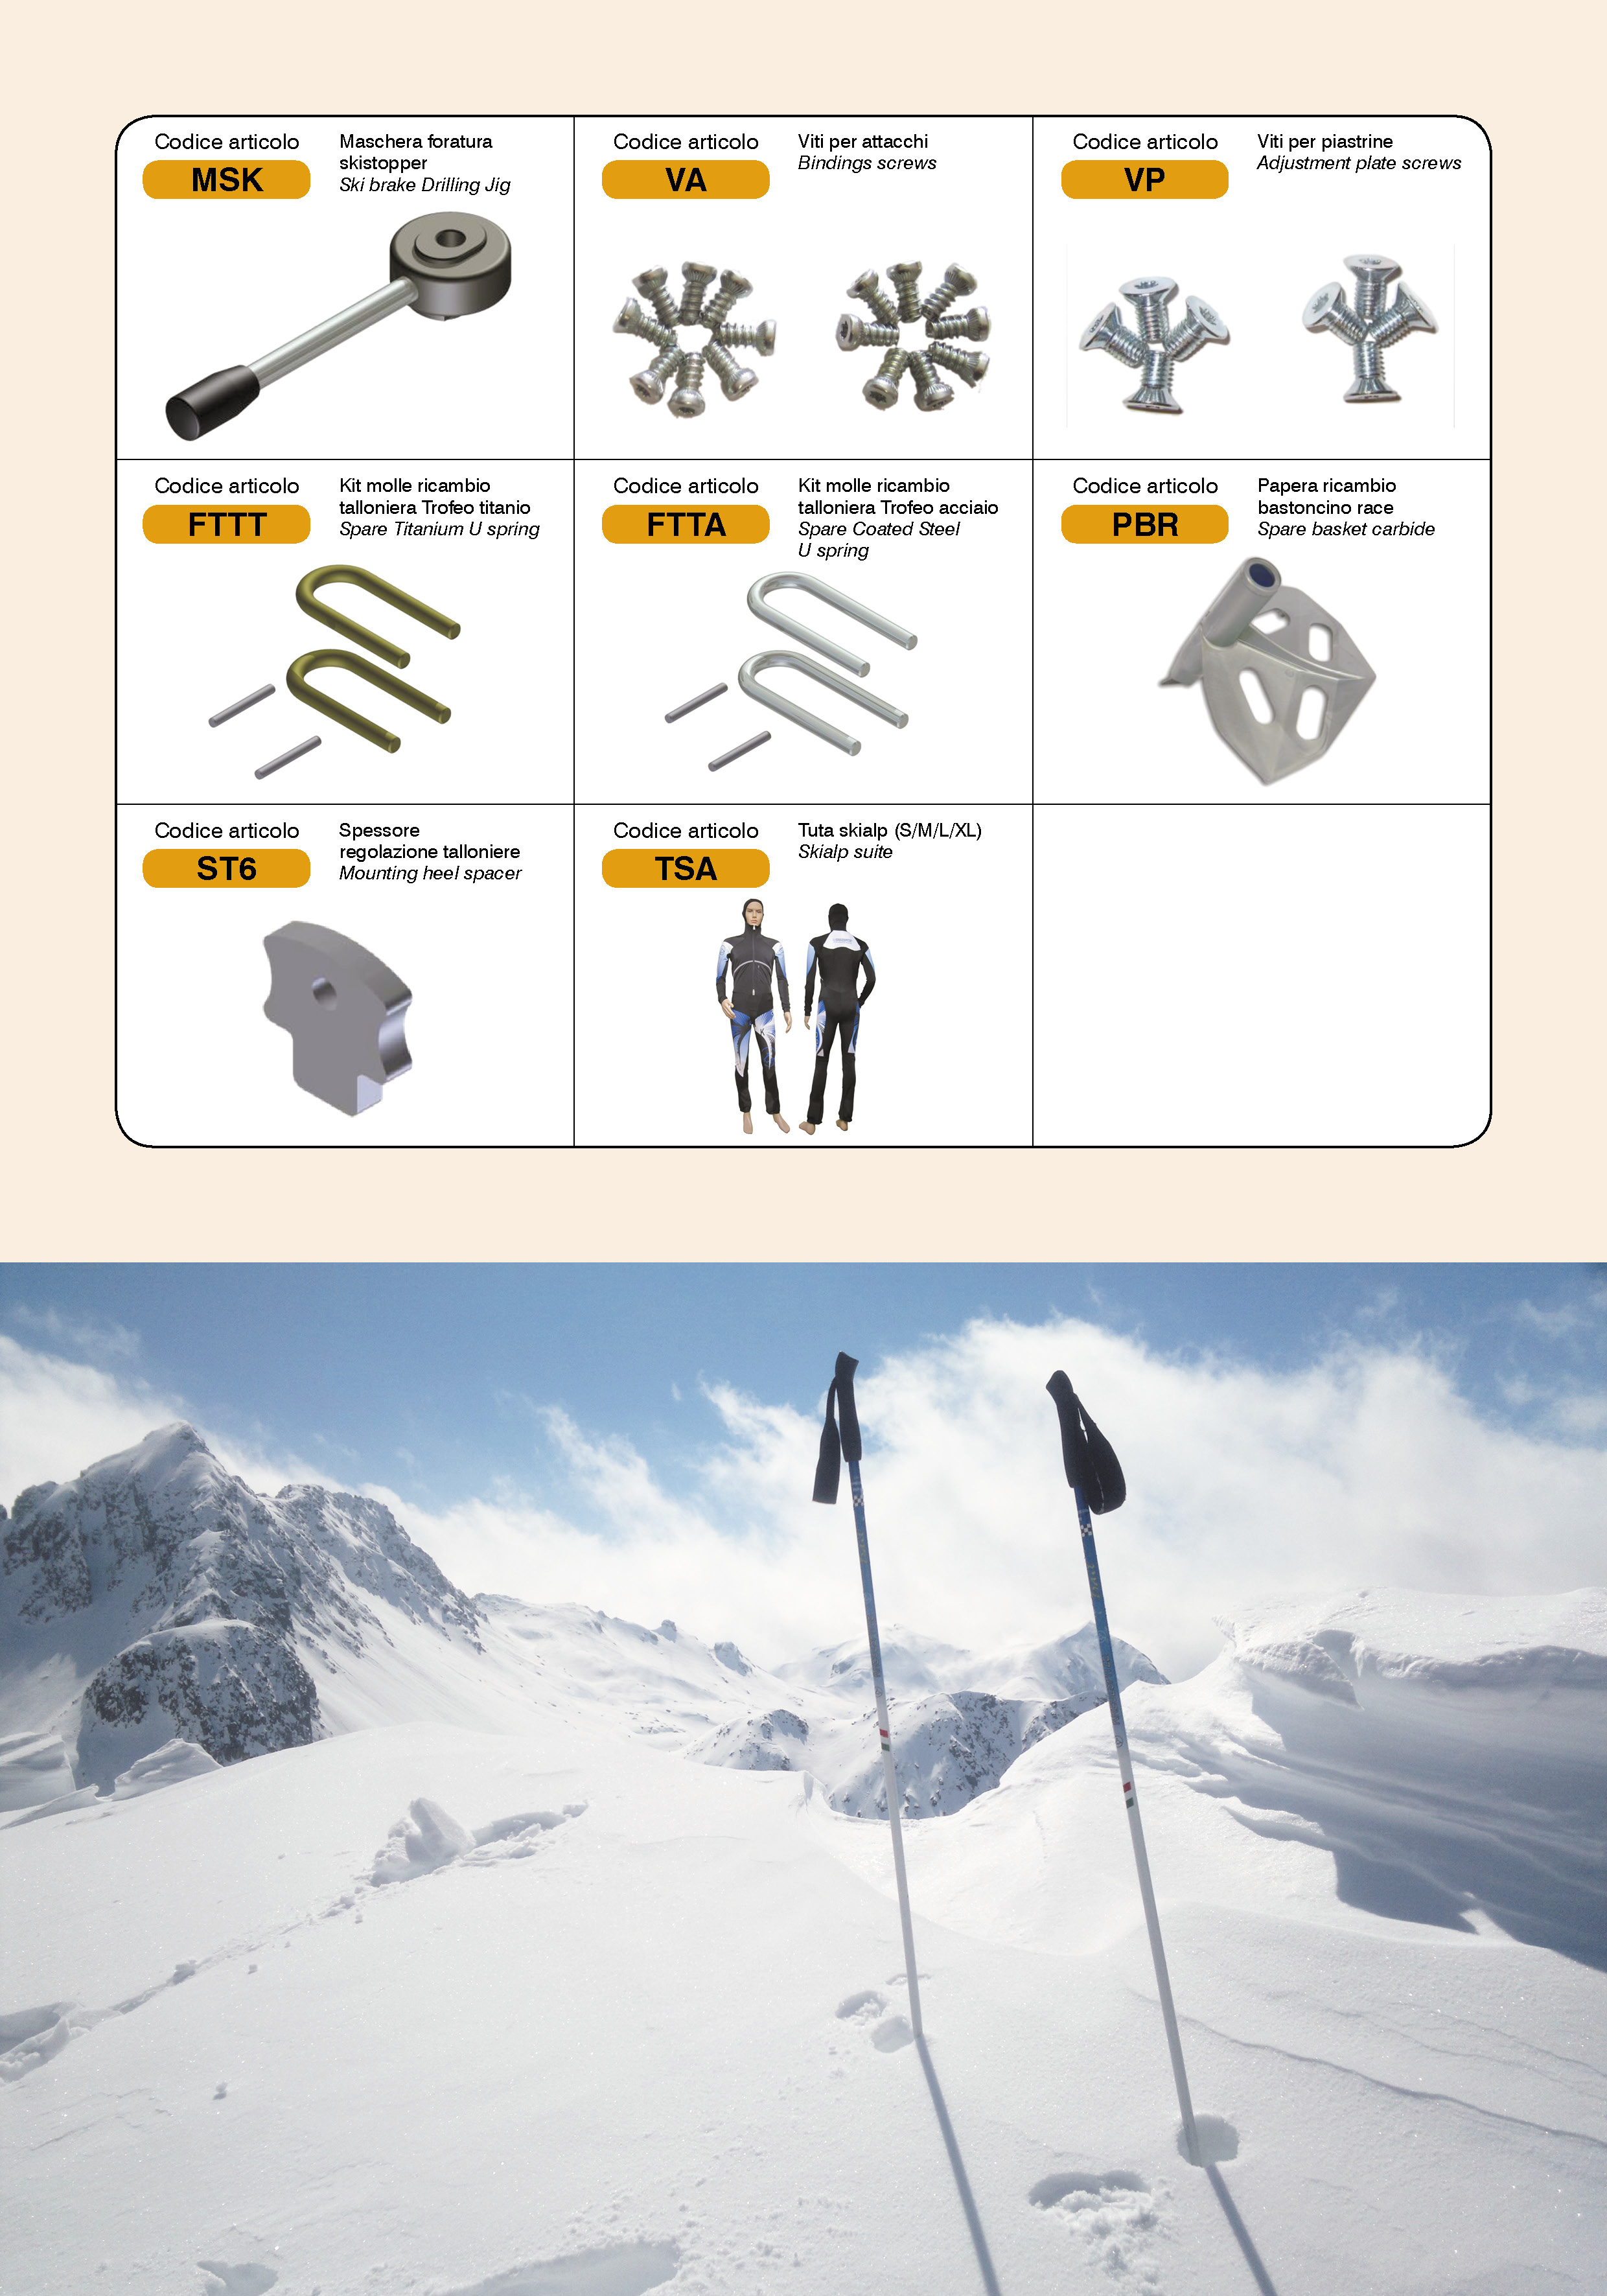 Catalogo prodotti Kreuzspitze 2017-18_3-3